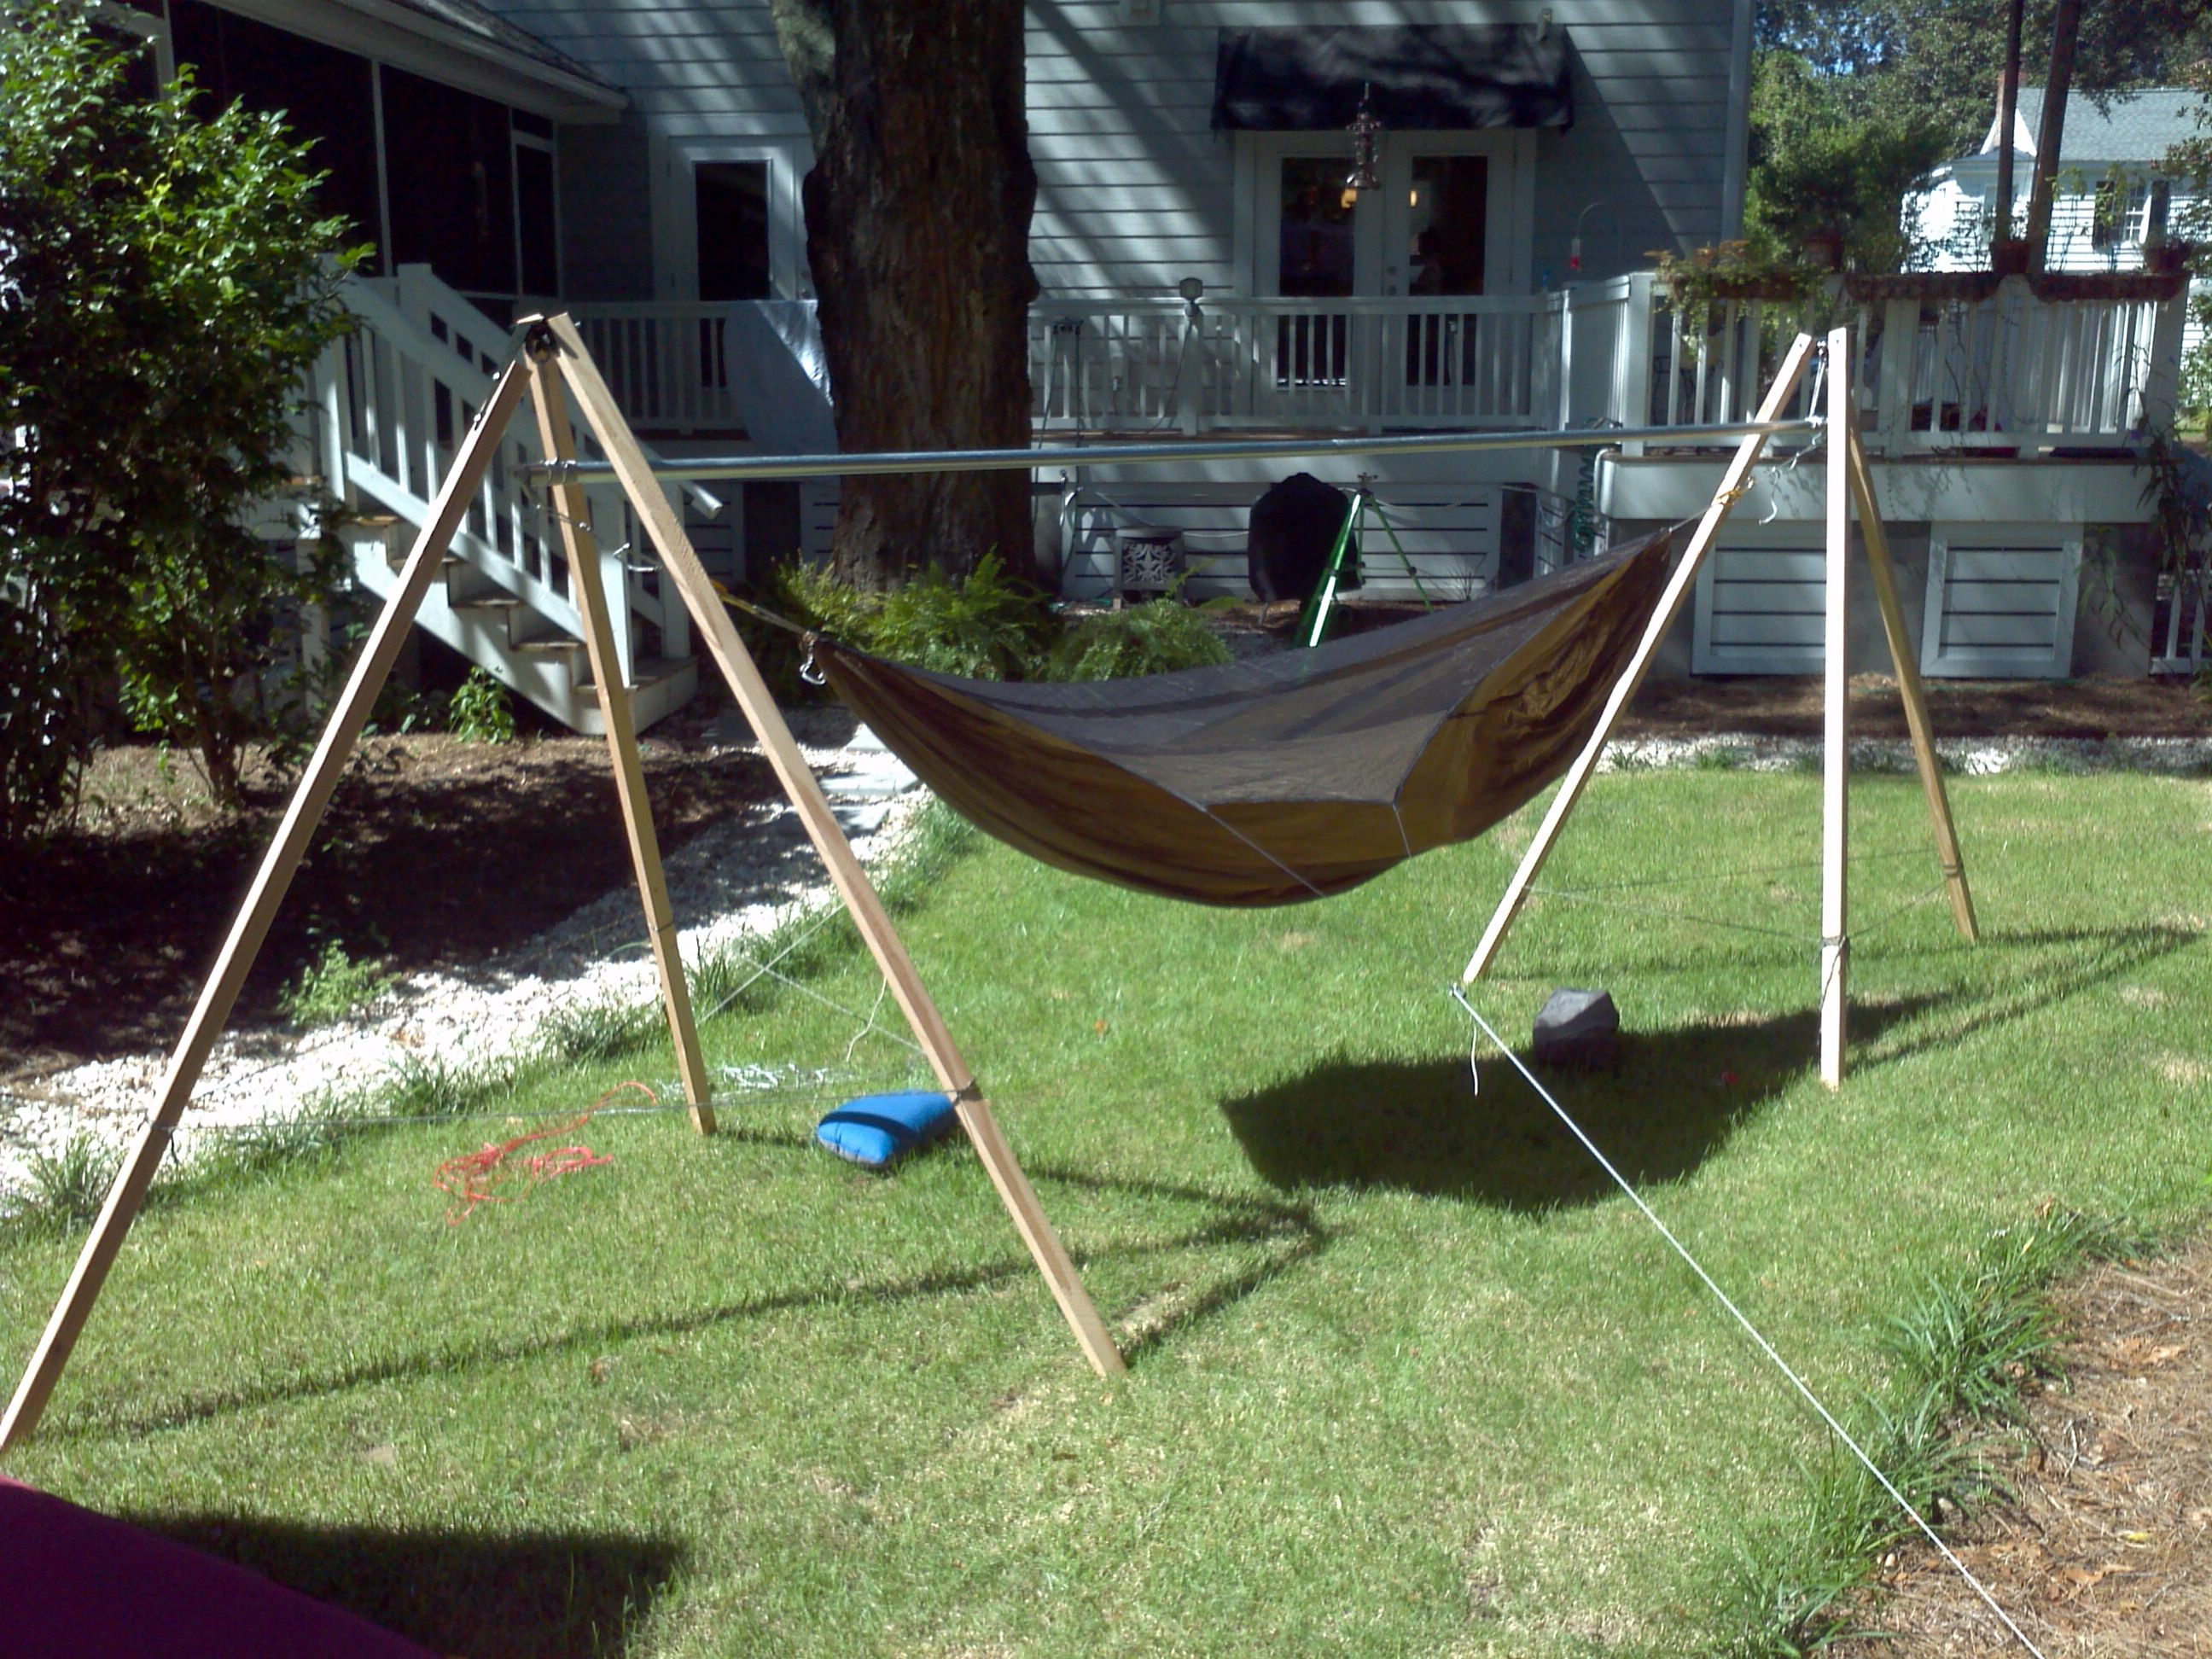 lady hammock hammocks rat pet toy dog cage food img the ideas